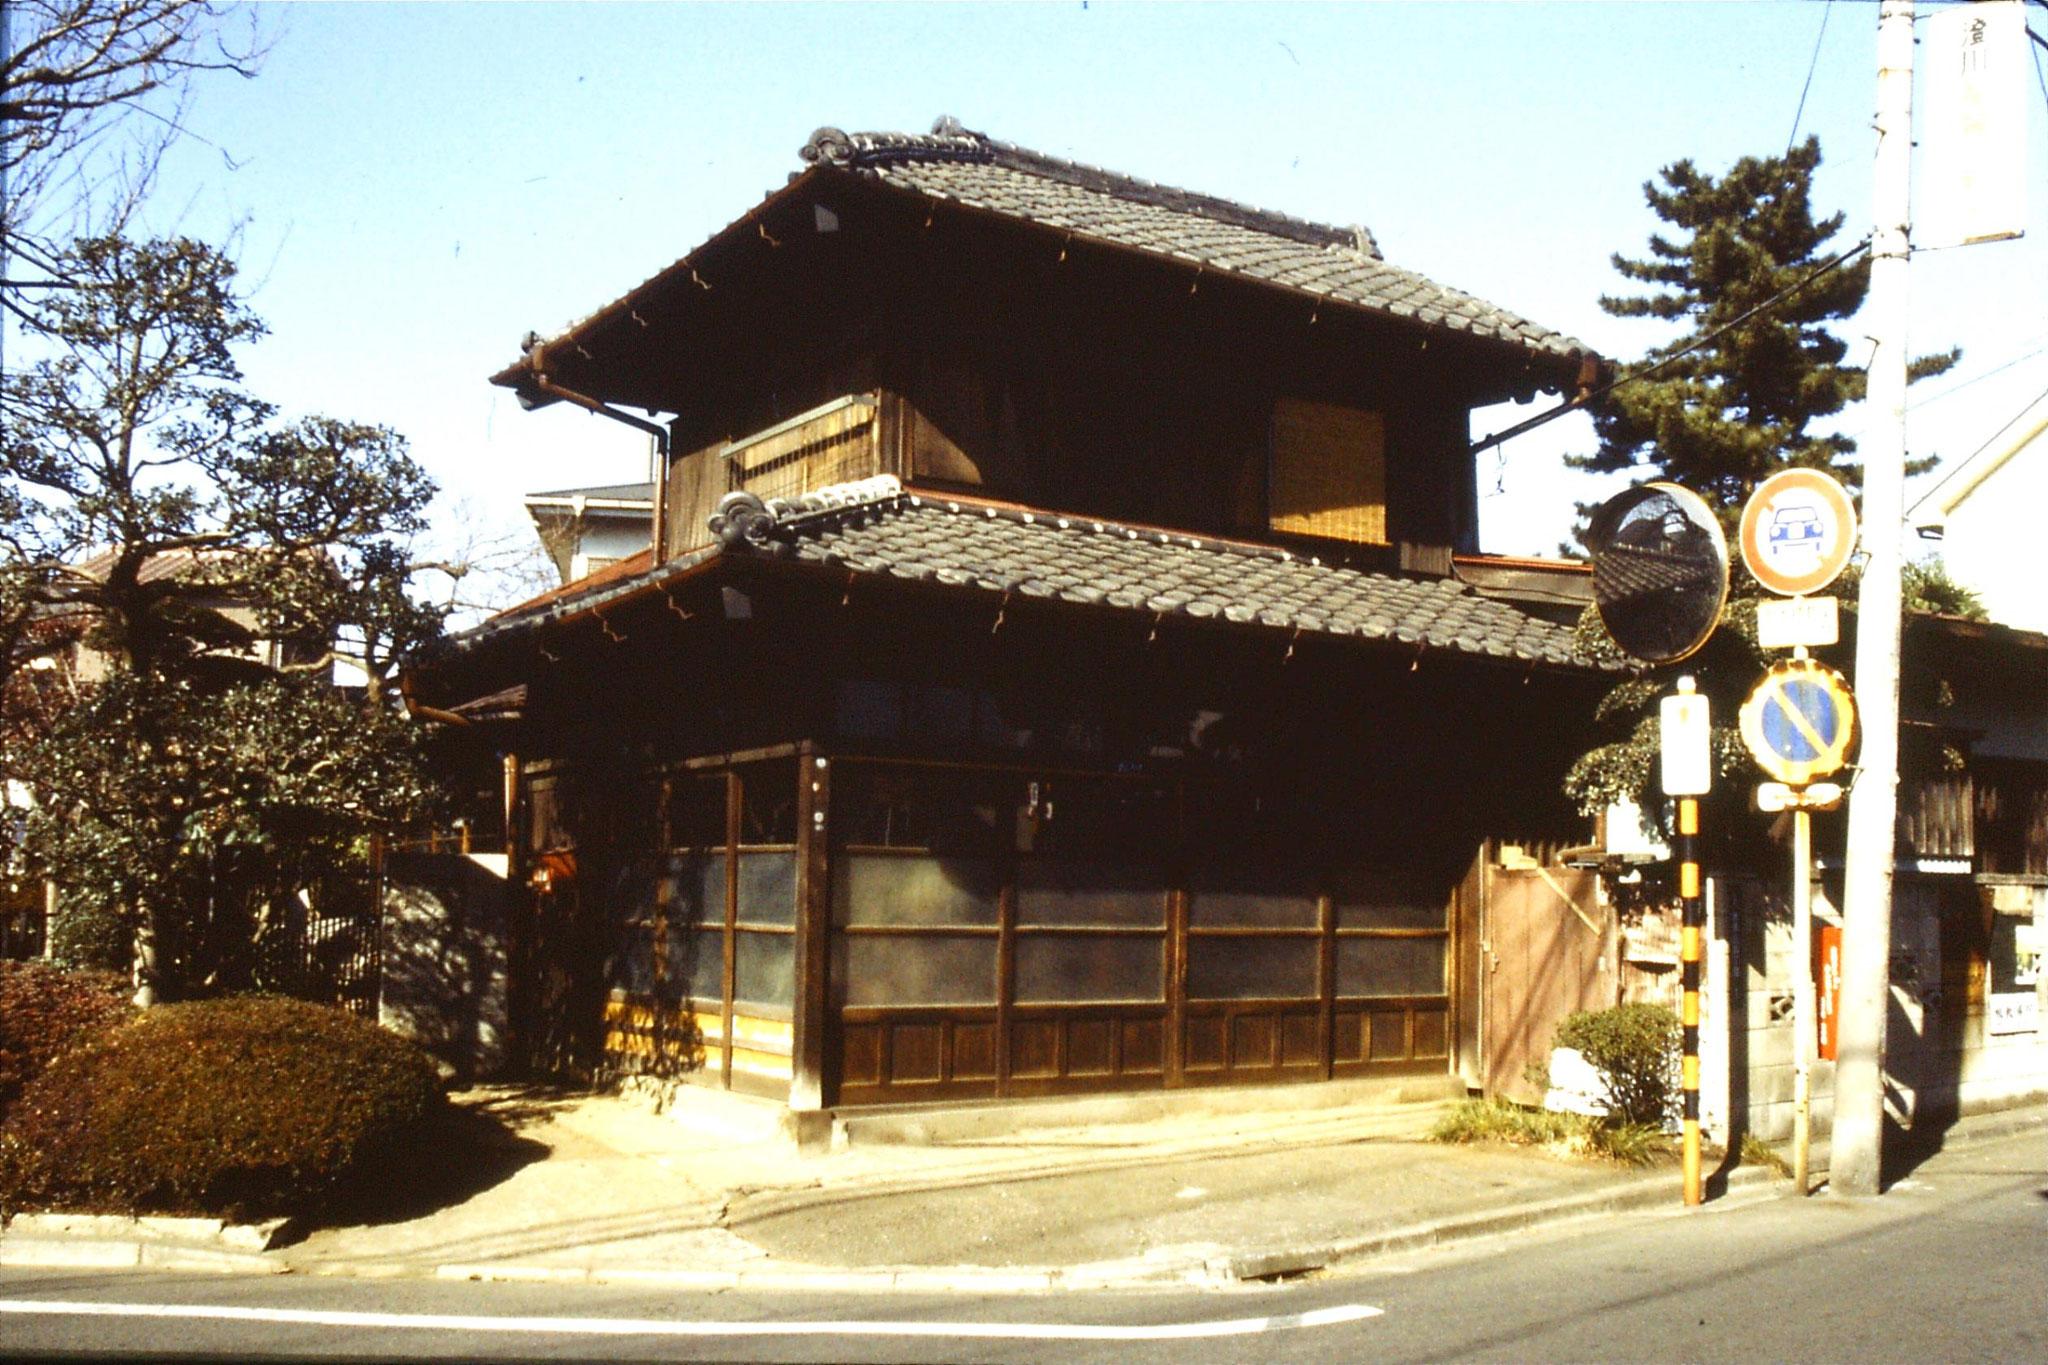 28/12/1988: 22: Tokyo nr Nishimagome